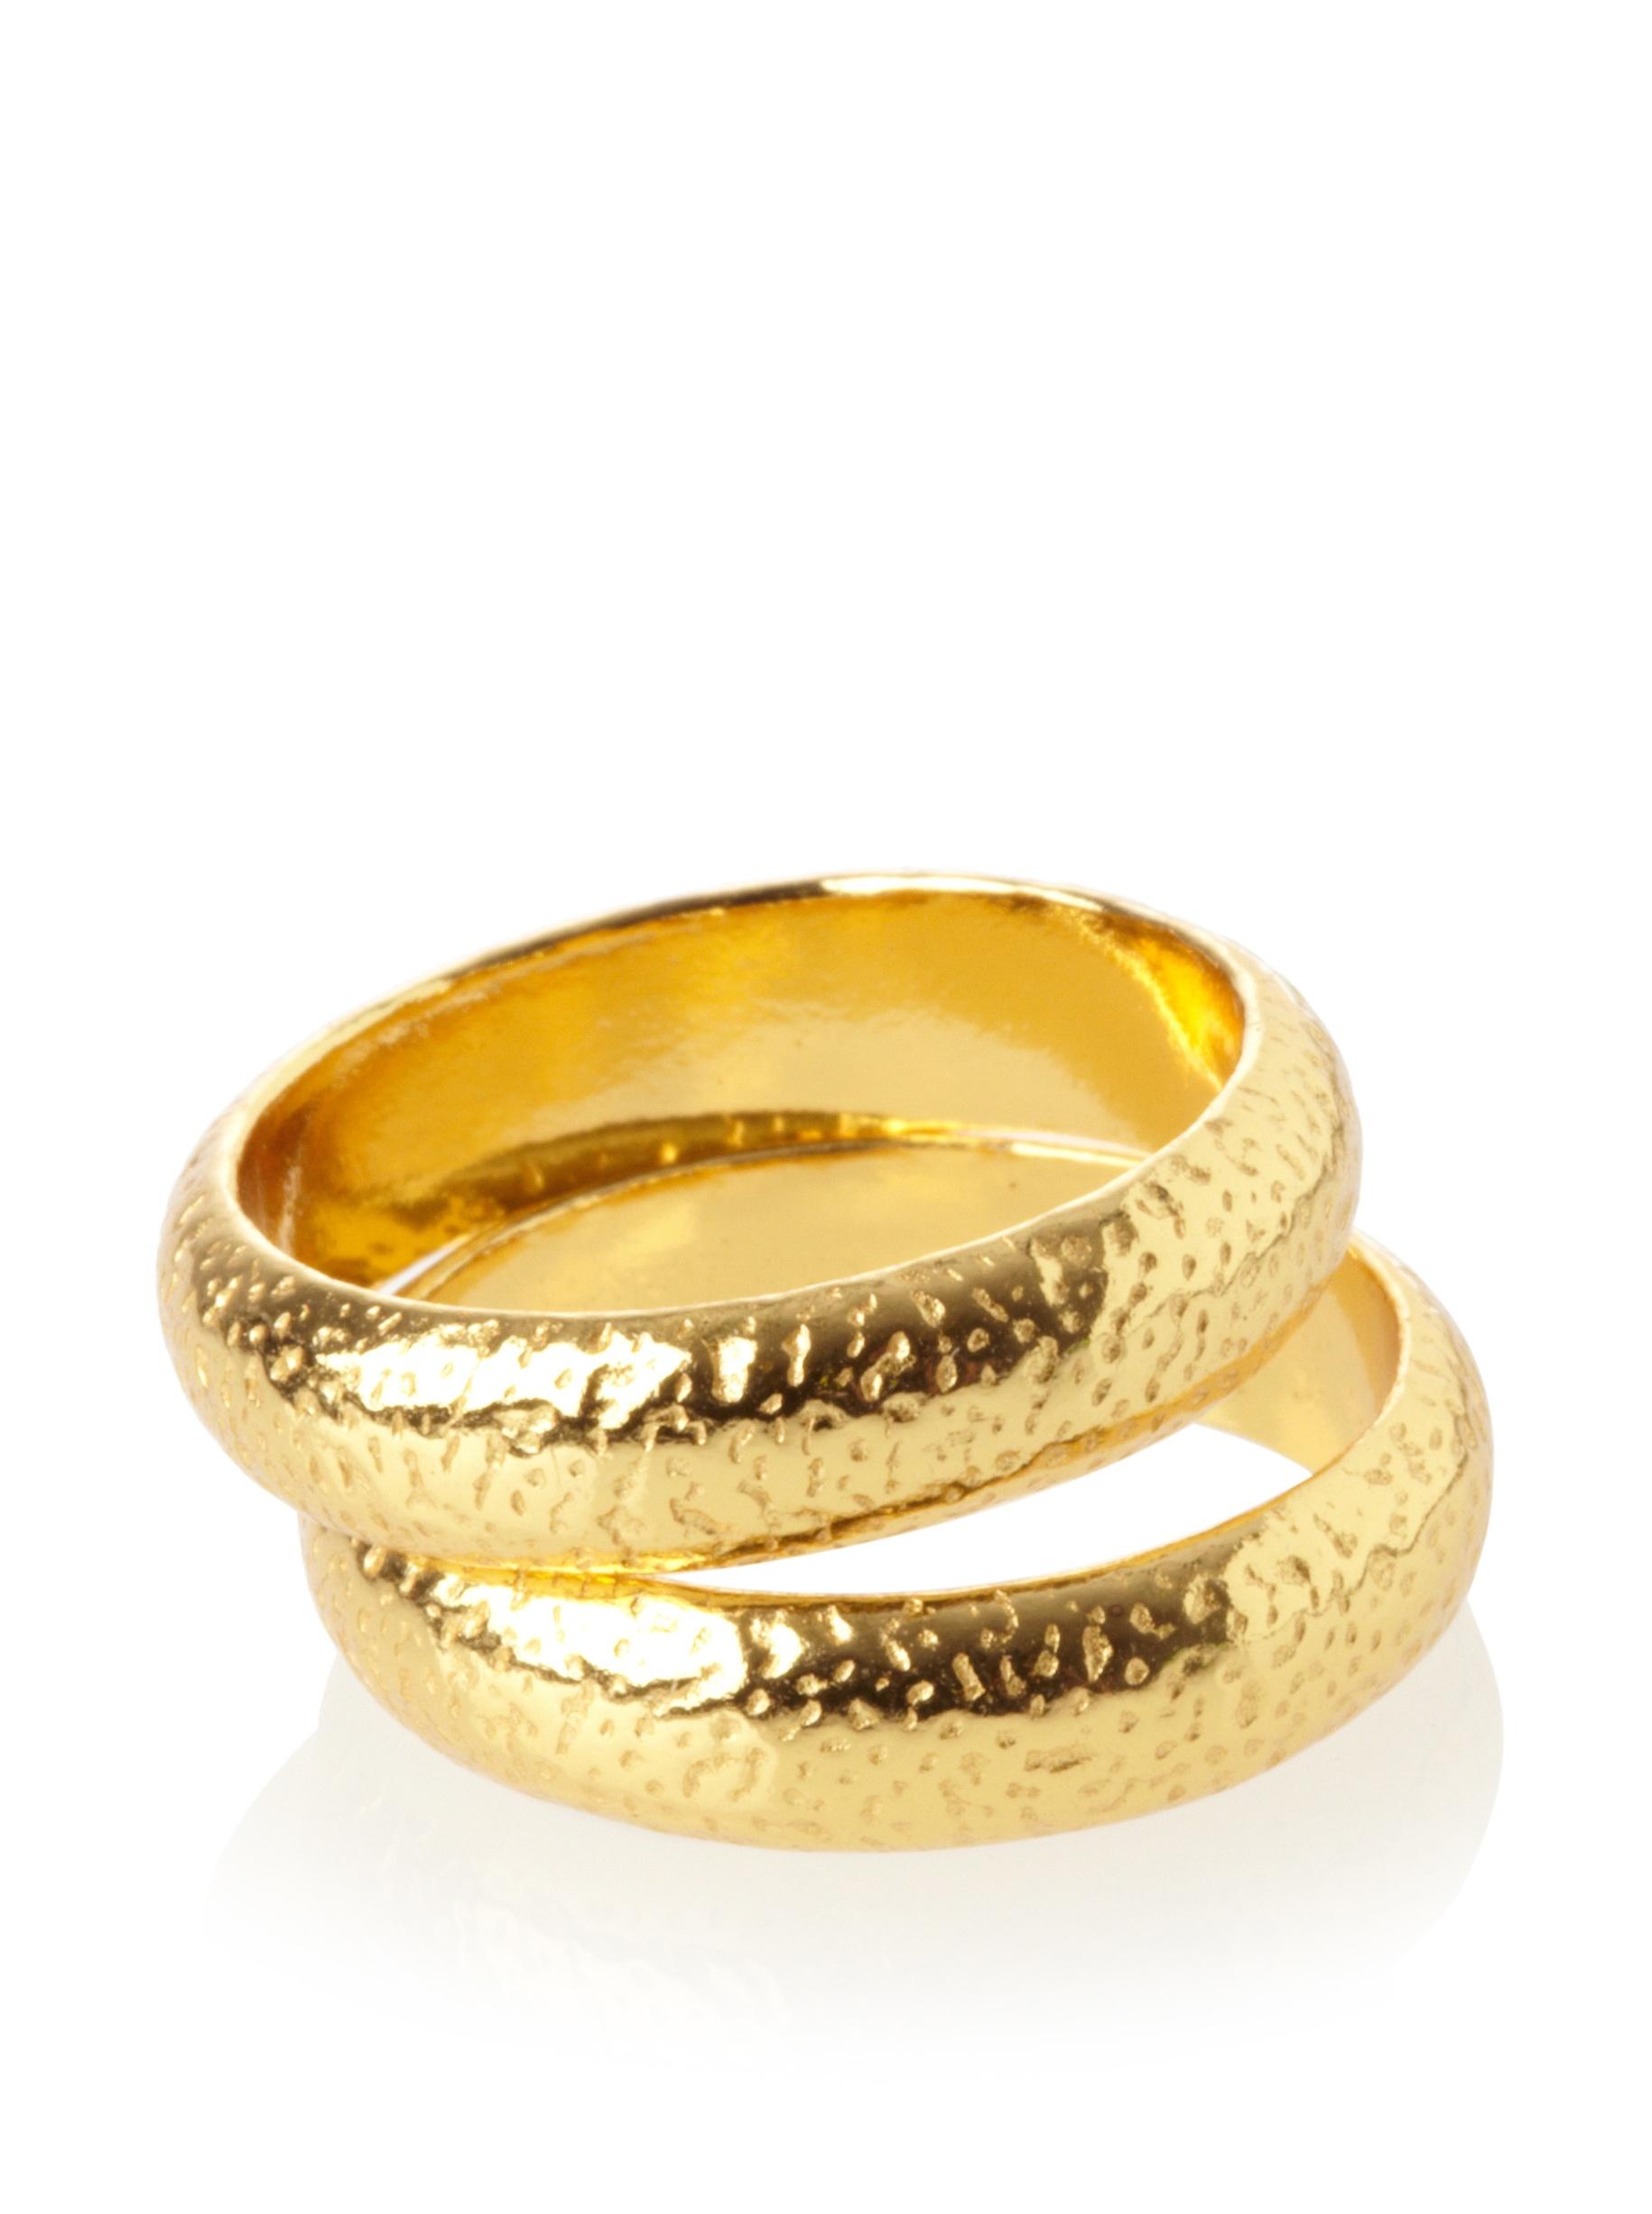 gorjana Set of 2 Hammered Rings, Gold, Size 7